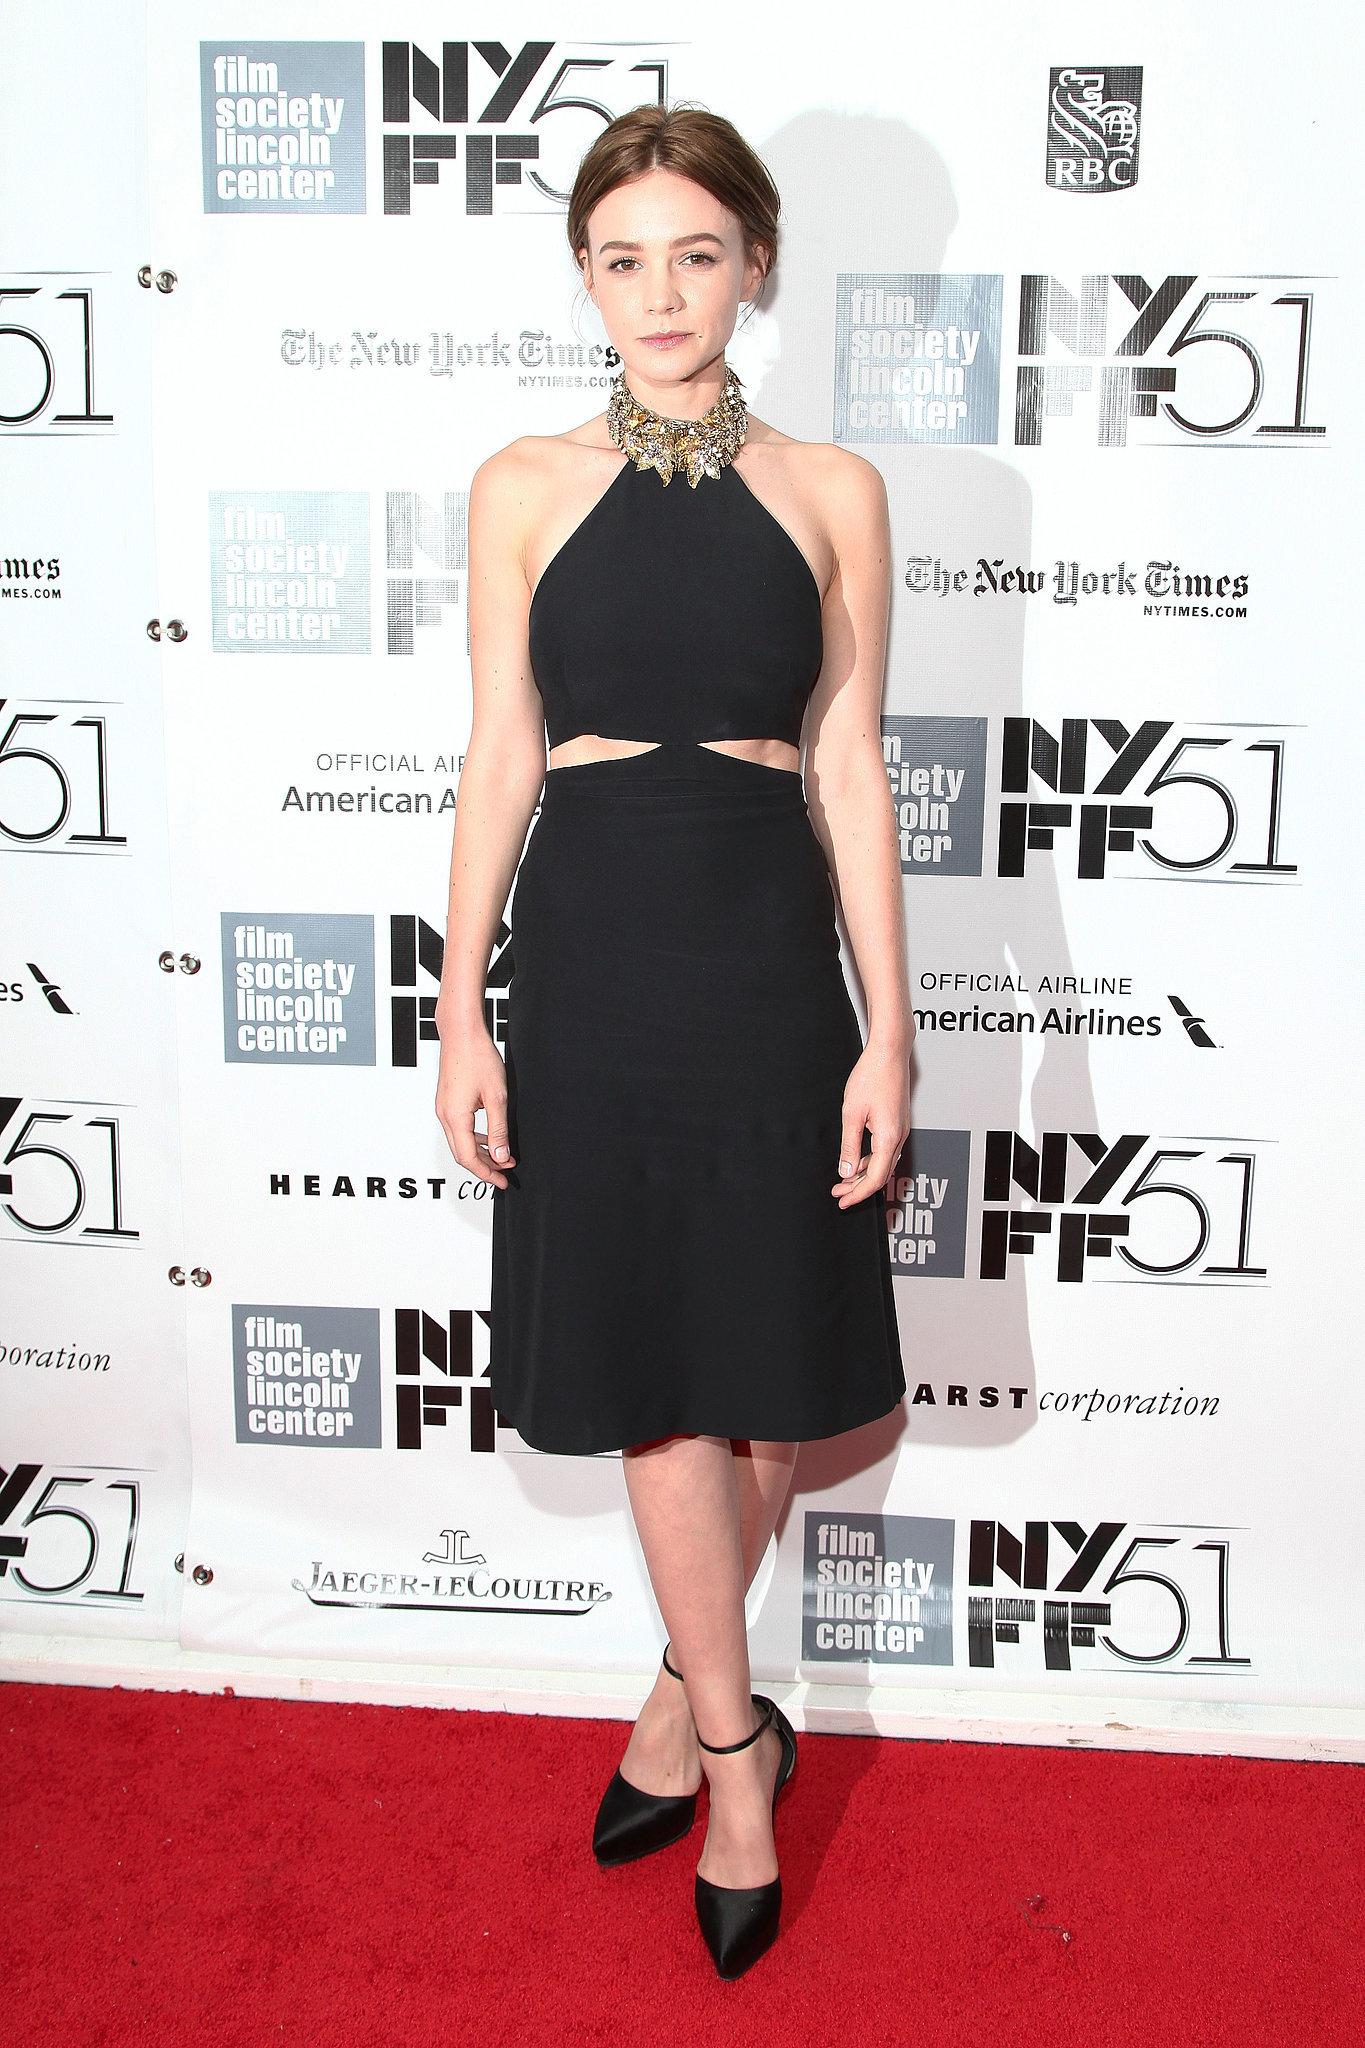 Carey Mulligan in Alexander McQueen at the 2013 New York Film Festival